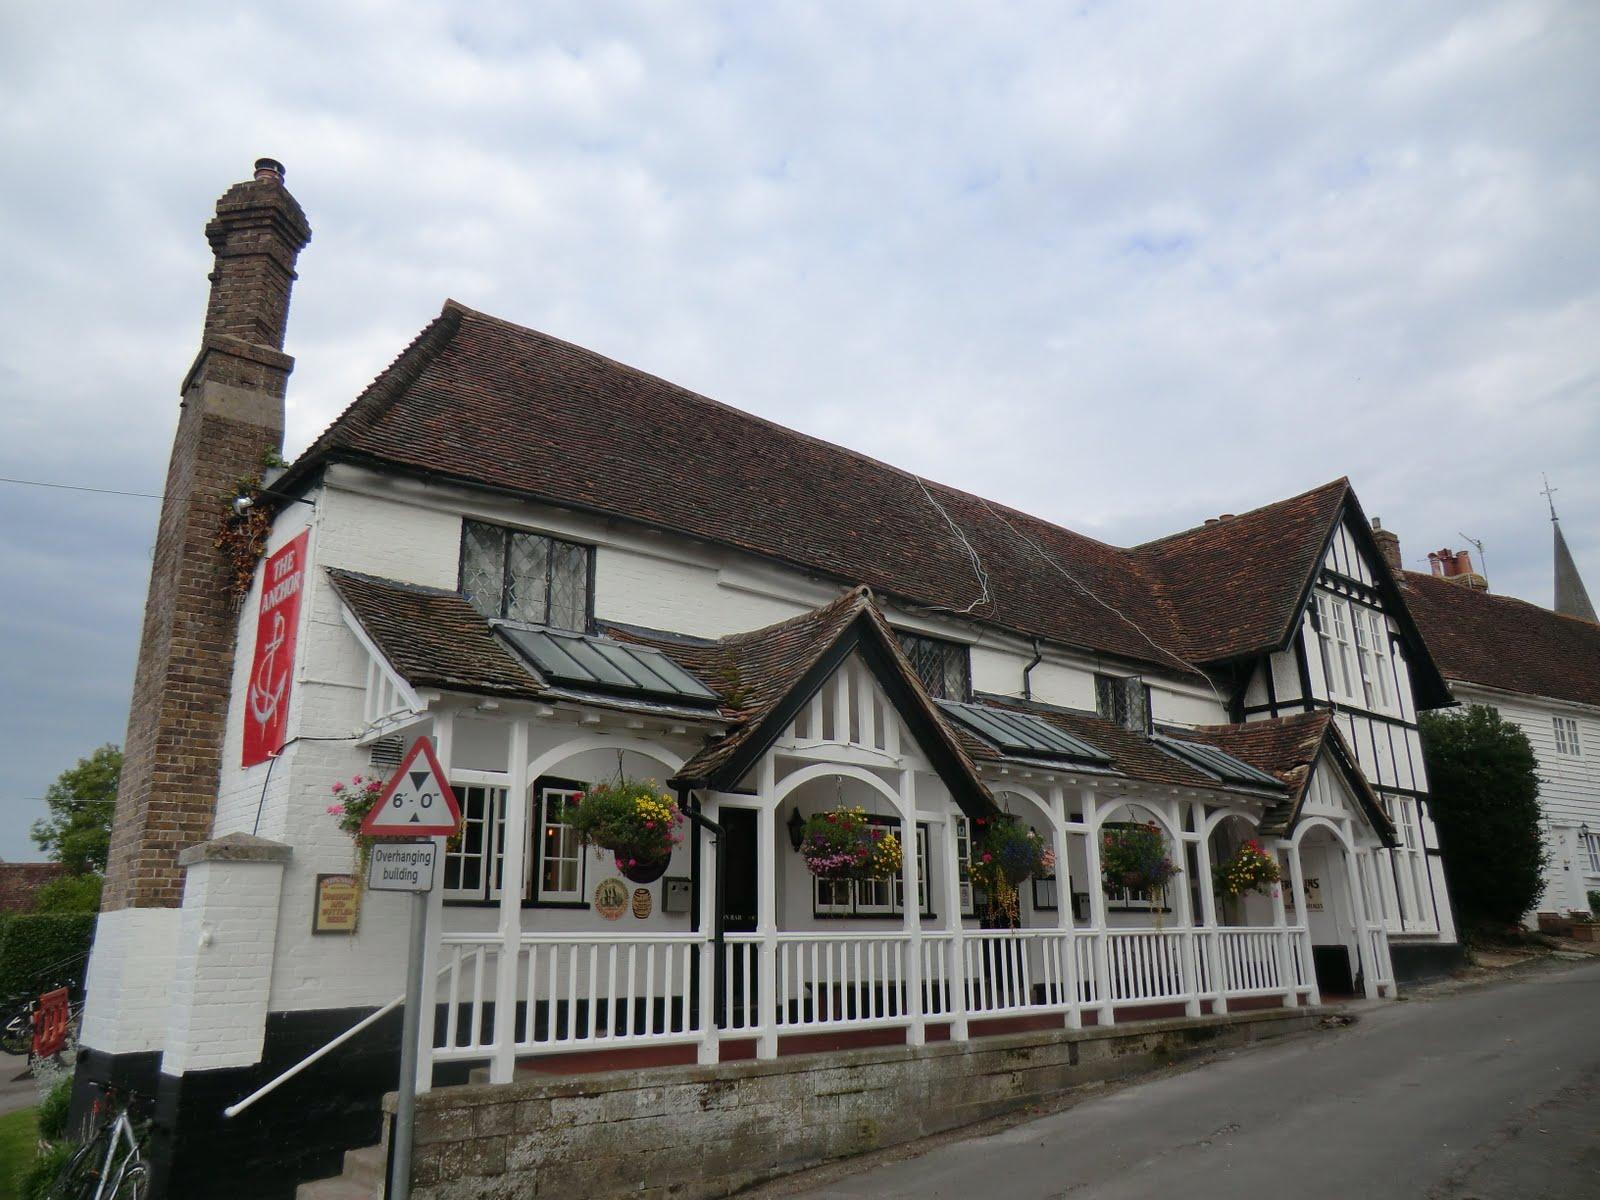 CIMG8790 Anchor Inn, Hartfield